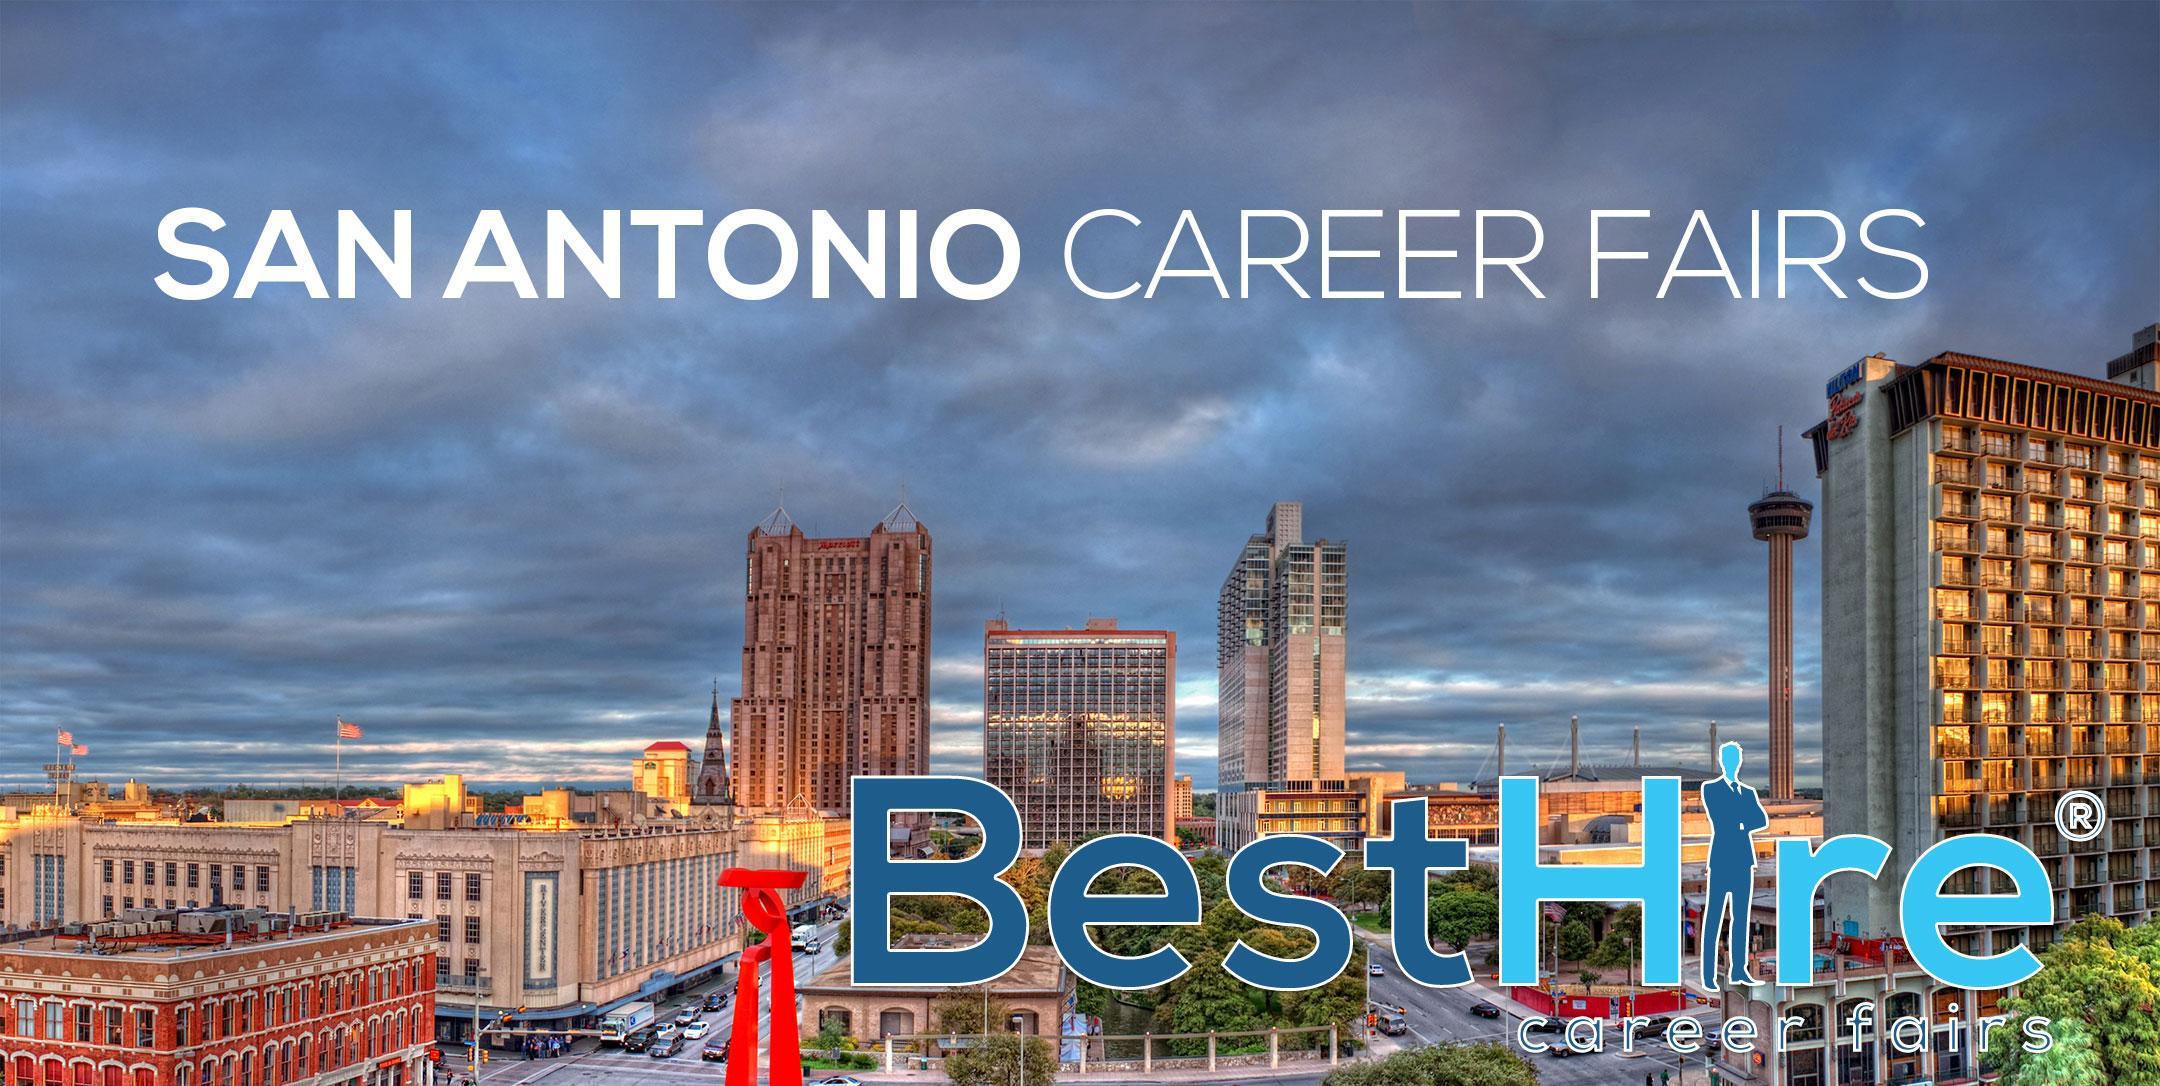 San Antonio Career Fair June 13, 2018 - Job Fairs & Hiring Events in San Antonio TX